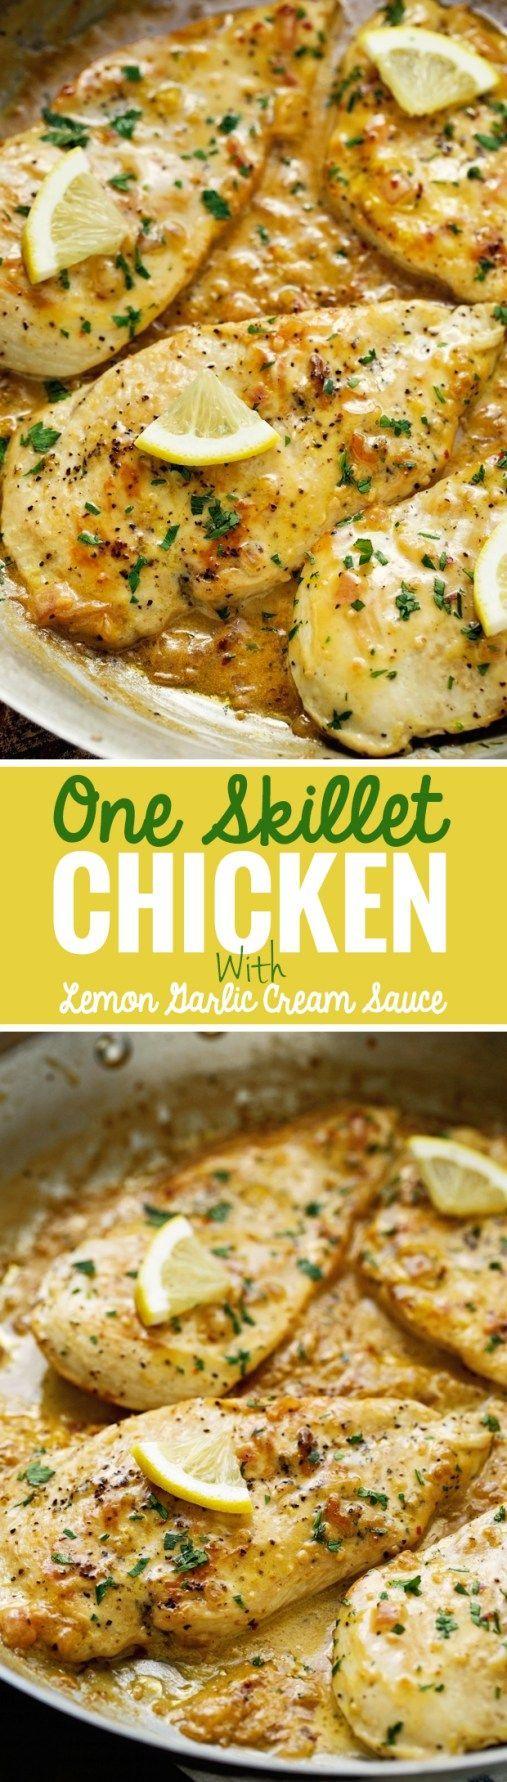 One Skillet Chicken topped with A Lemon garlic Cream Sauce - Ready in 30 minutes are perfect over a bed of angel hair pasta! #lemonchicken #skilletchicken #oneskilletchicken | http://Littlespicejar.com /littlespicejar/